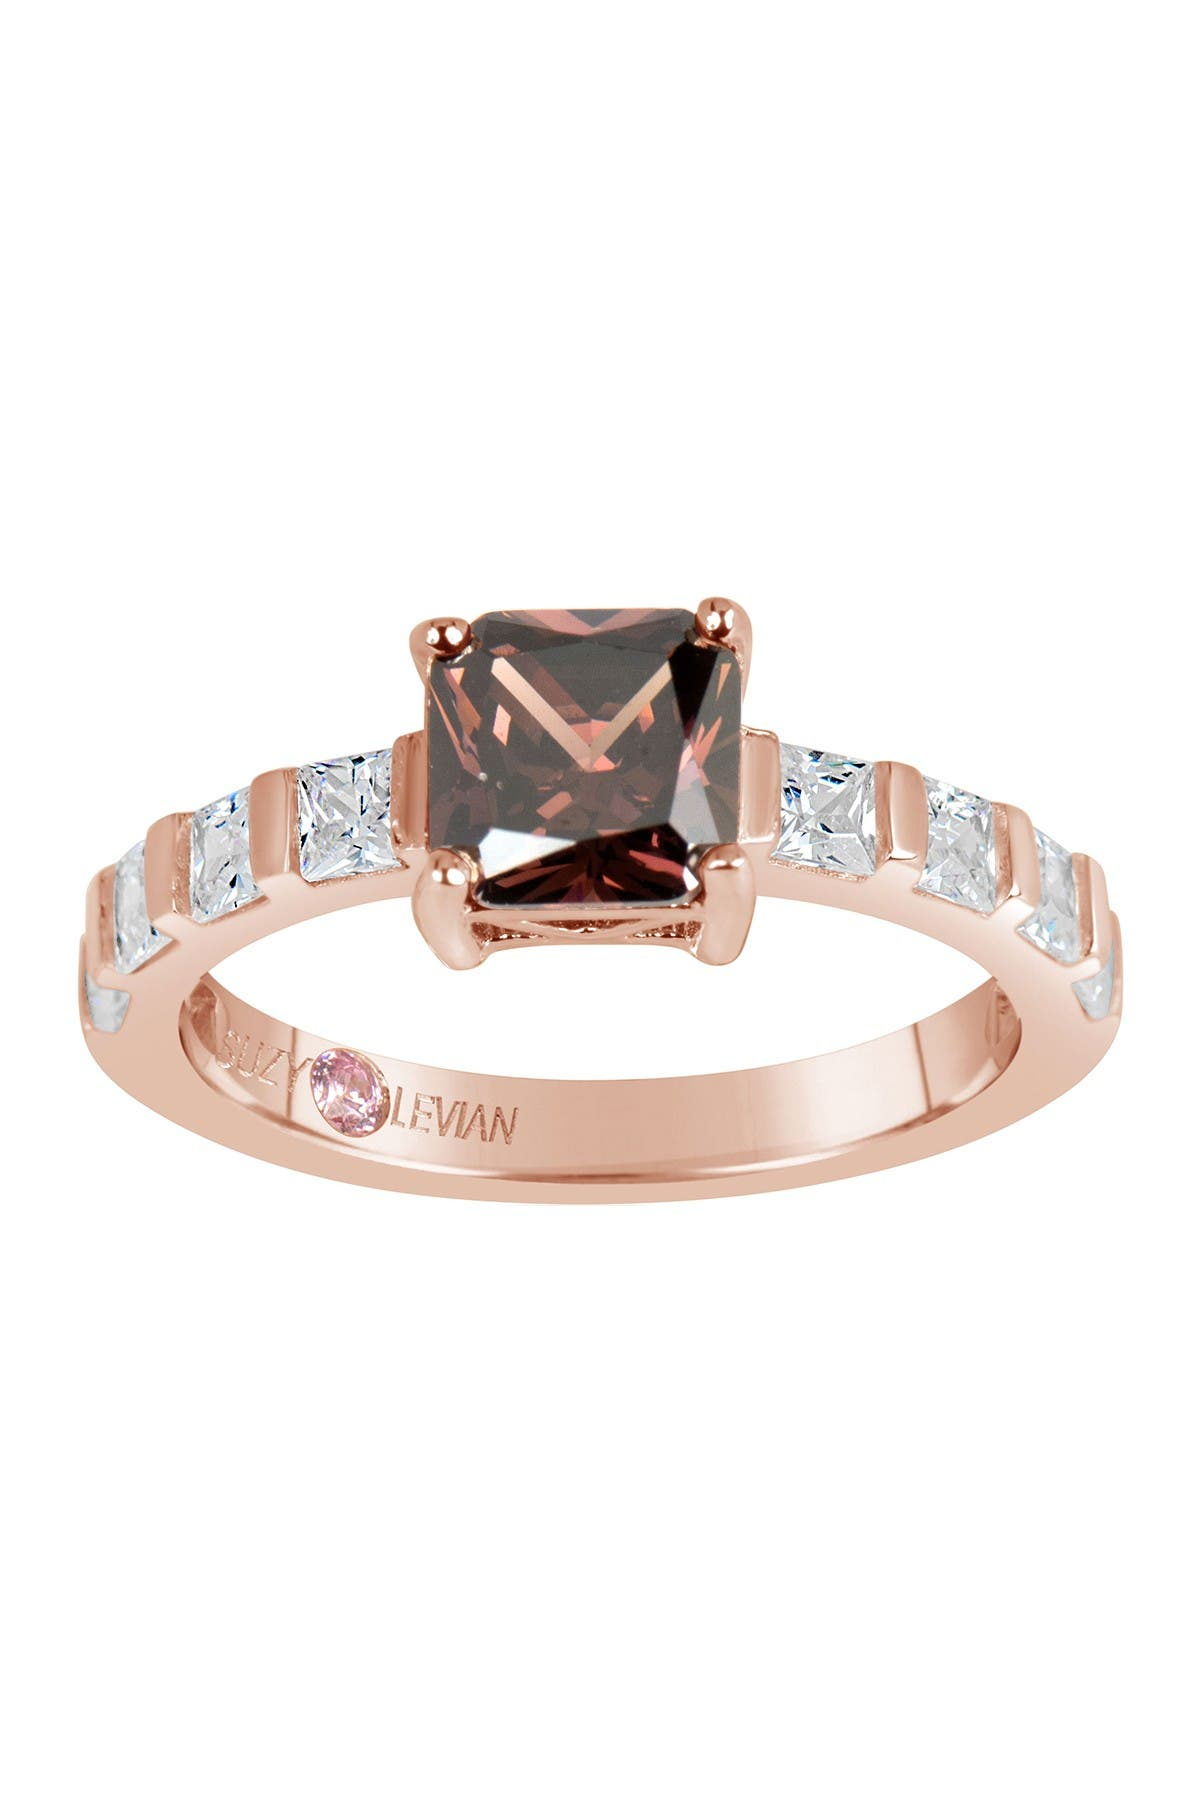 Image of Suzy Levian Prong Set Asscher Cut CZ Solitaire Ring